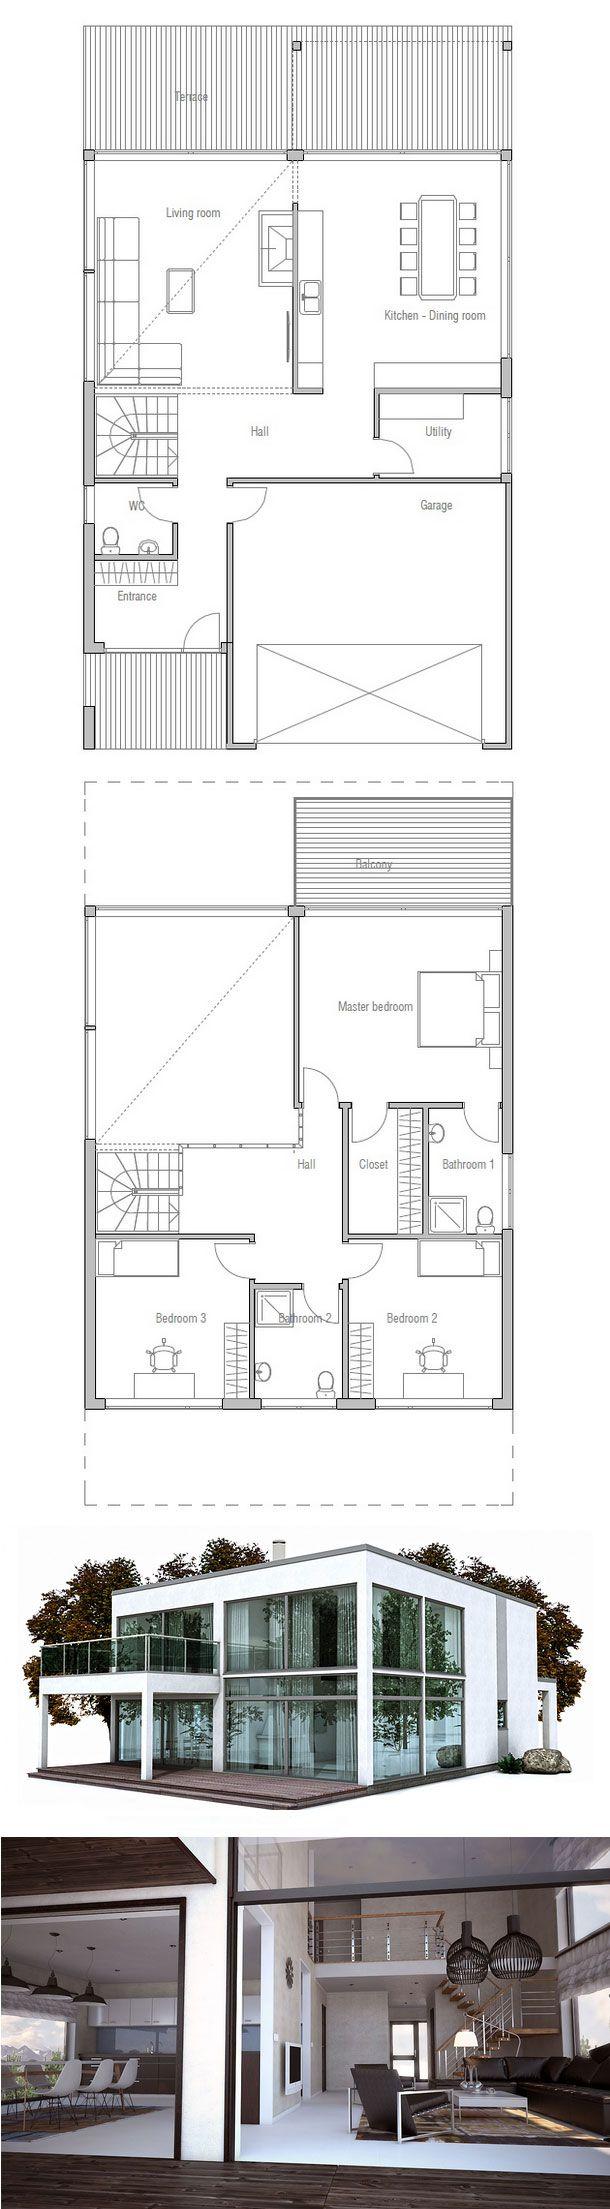 Best 25 Contemporary Home Plans Ideas On Pinterest